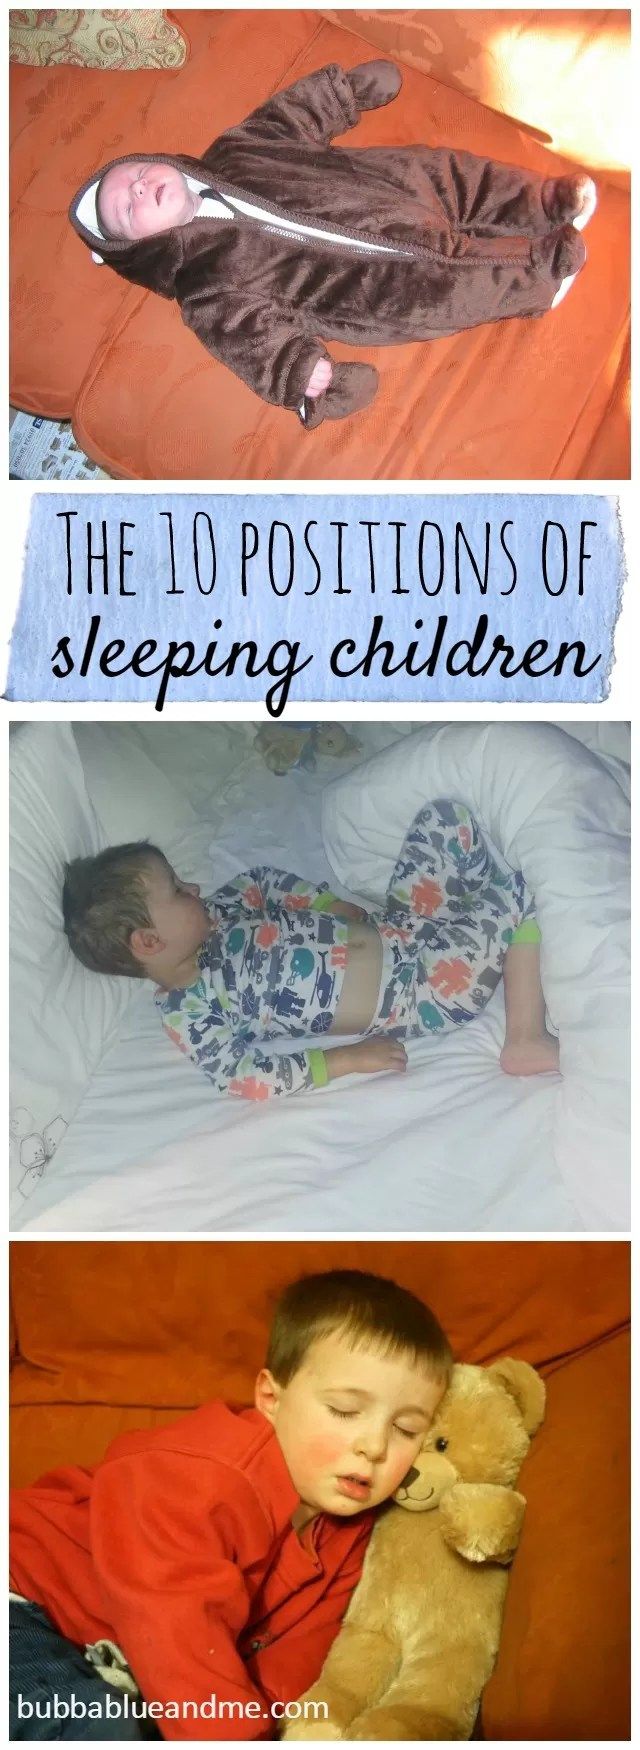 10 sleep positions of sleeping children - Bubbablue and me